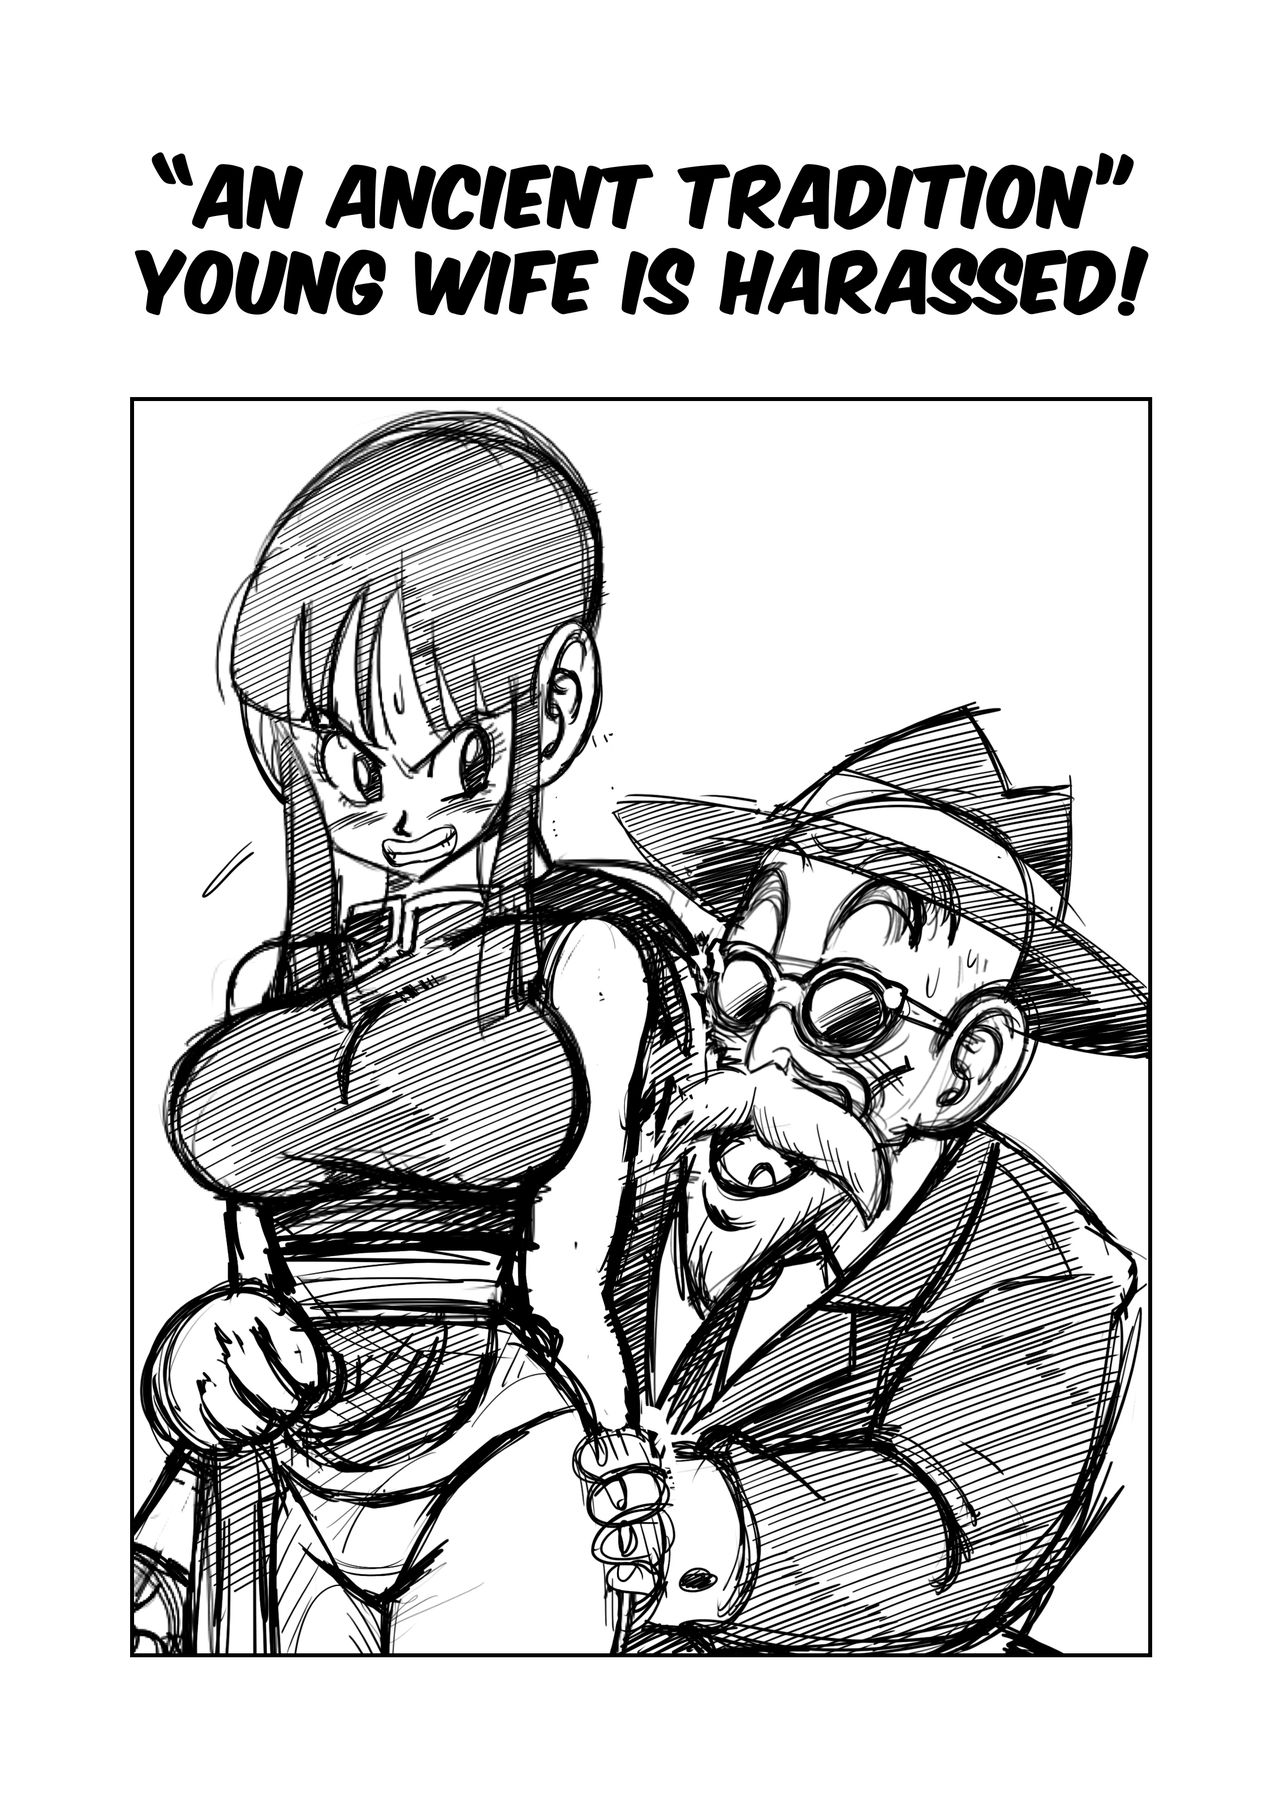 Joven esposa es abusada yamamoto 03